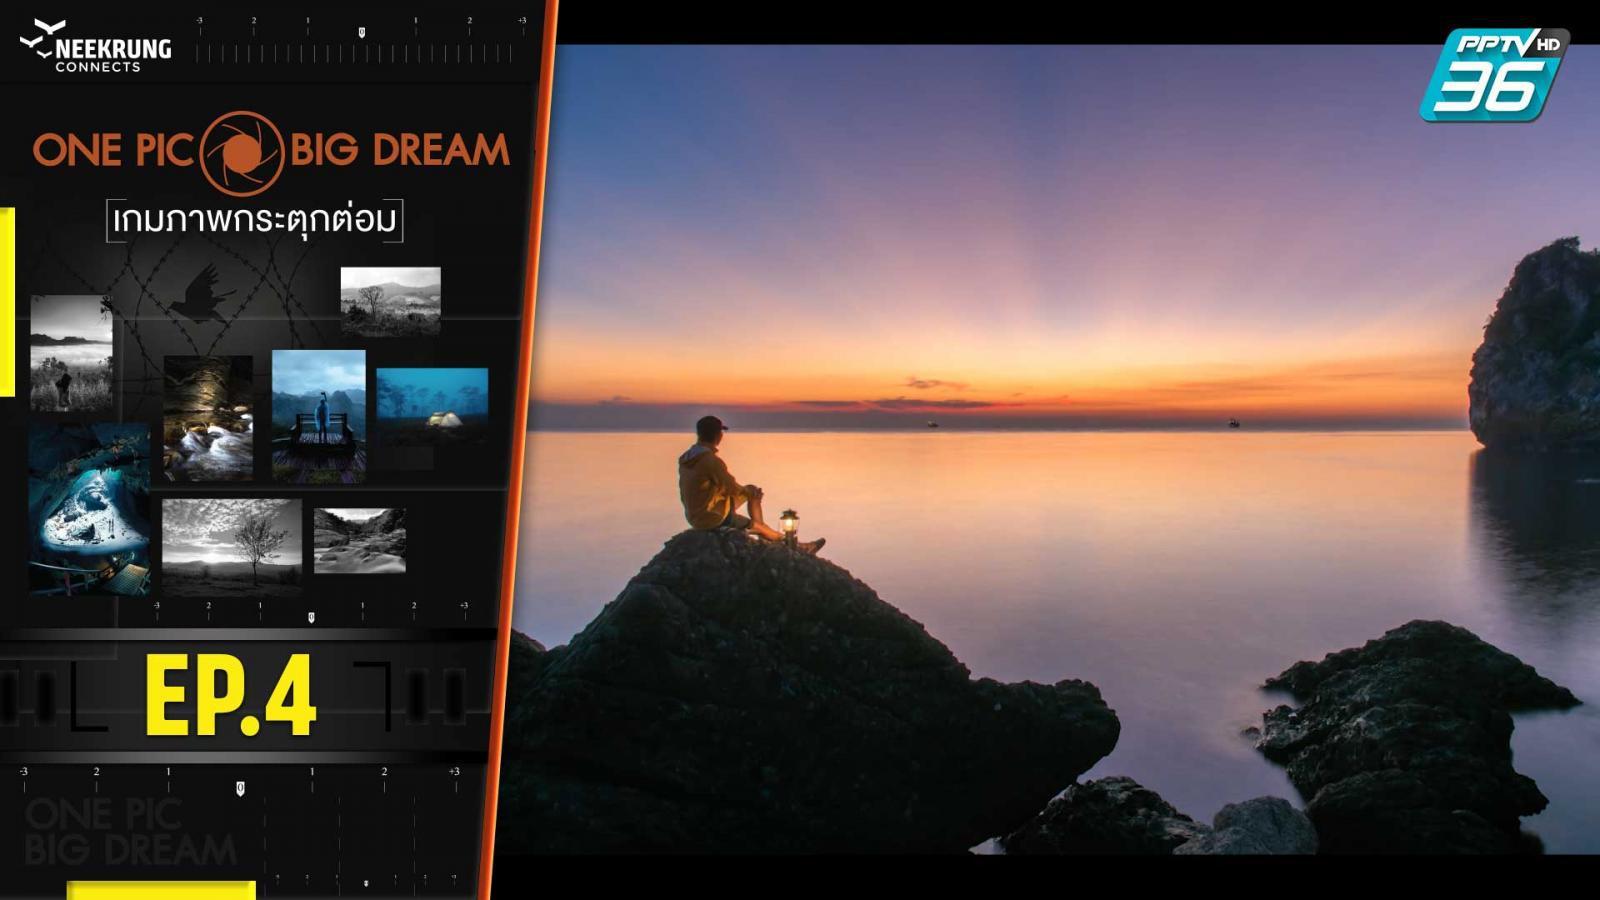 ONE PIC BIG DREAM เกมภาพกระตุกต่อม EP.4 | 22 ก.ค. 63 | PPTV HD 36